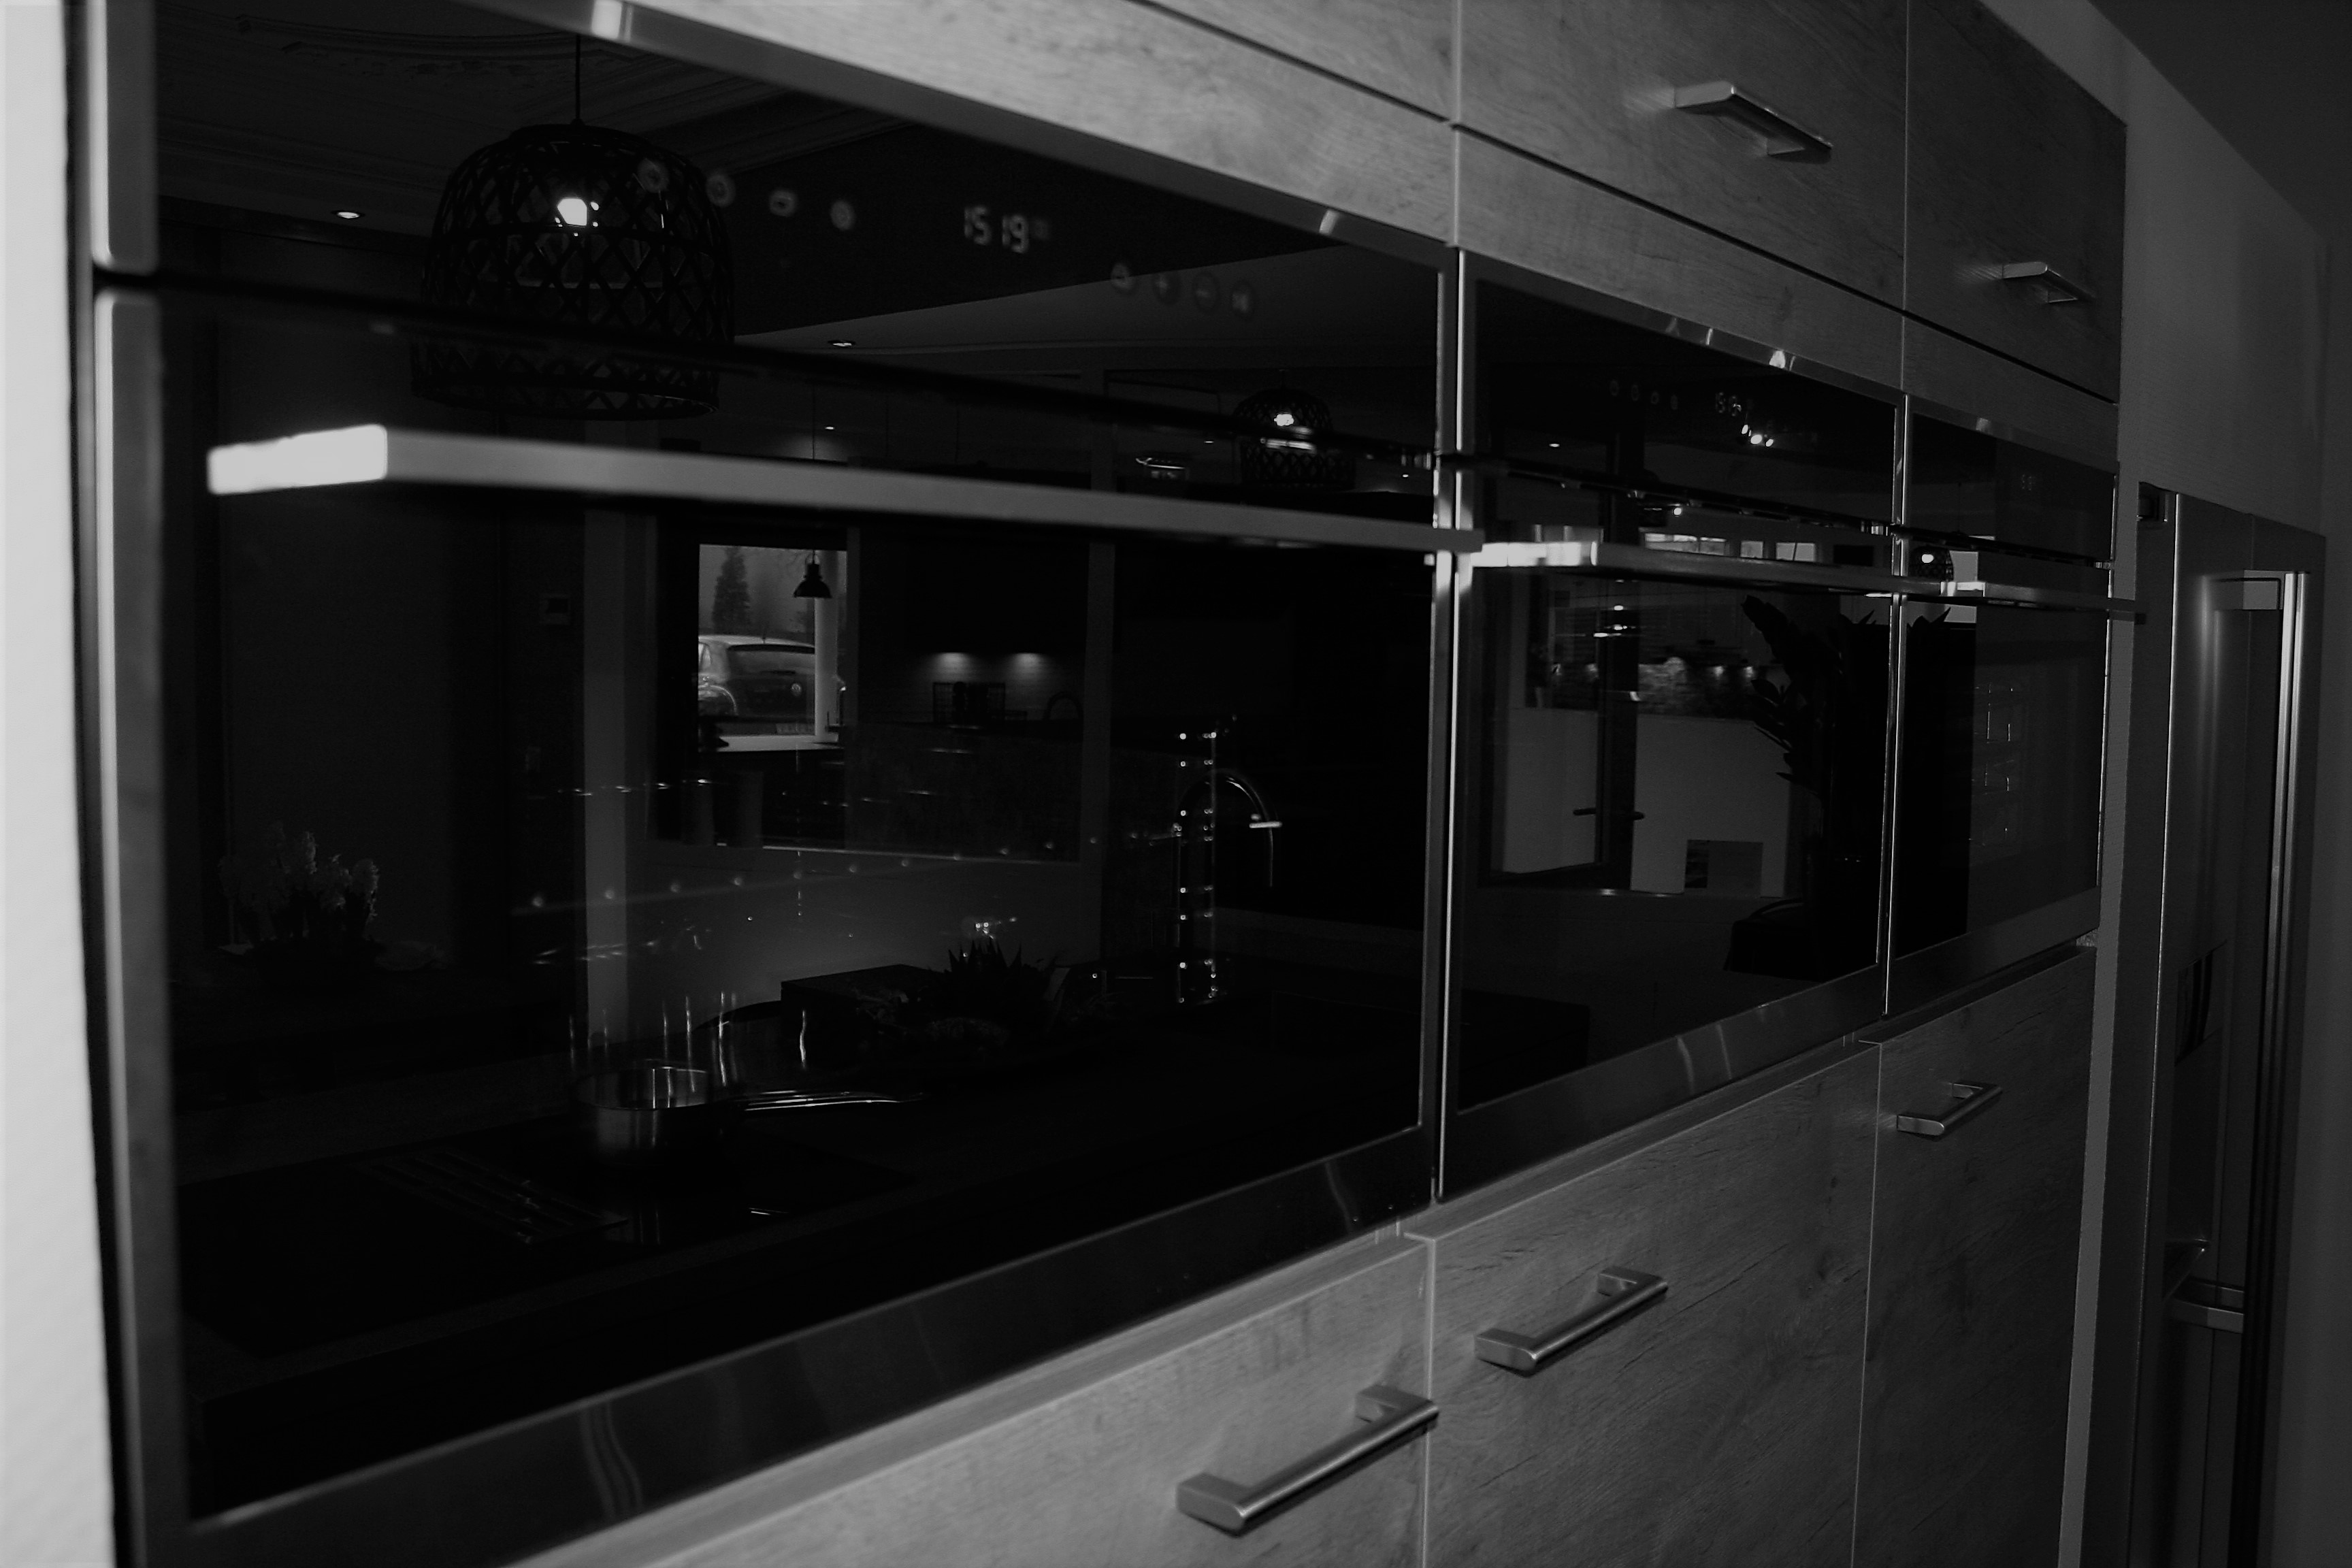 Black Industriele Keuken : Keukeninspiratie industriele keukens budgetplan